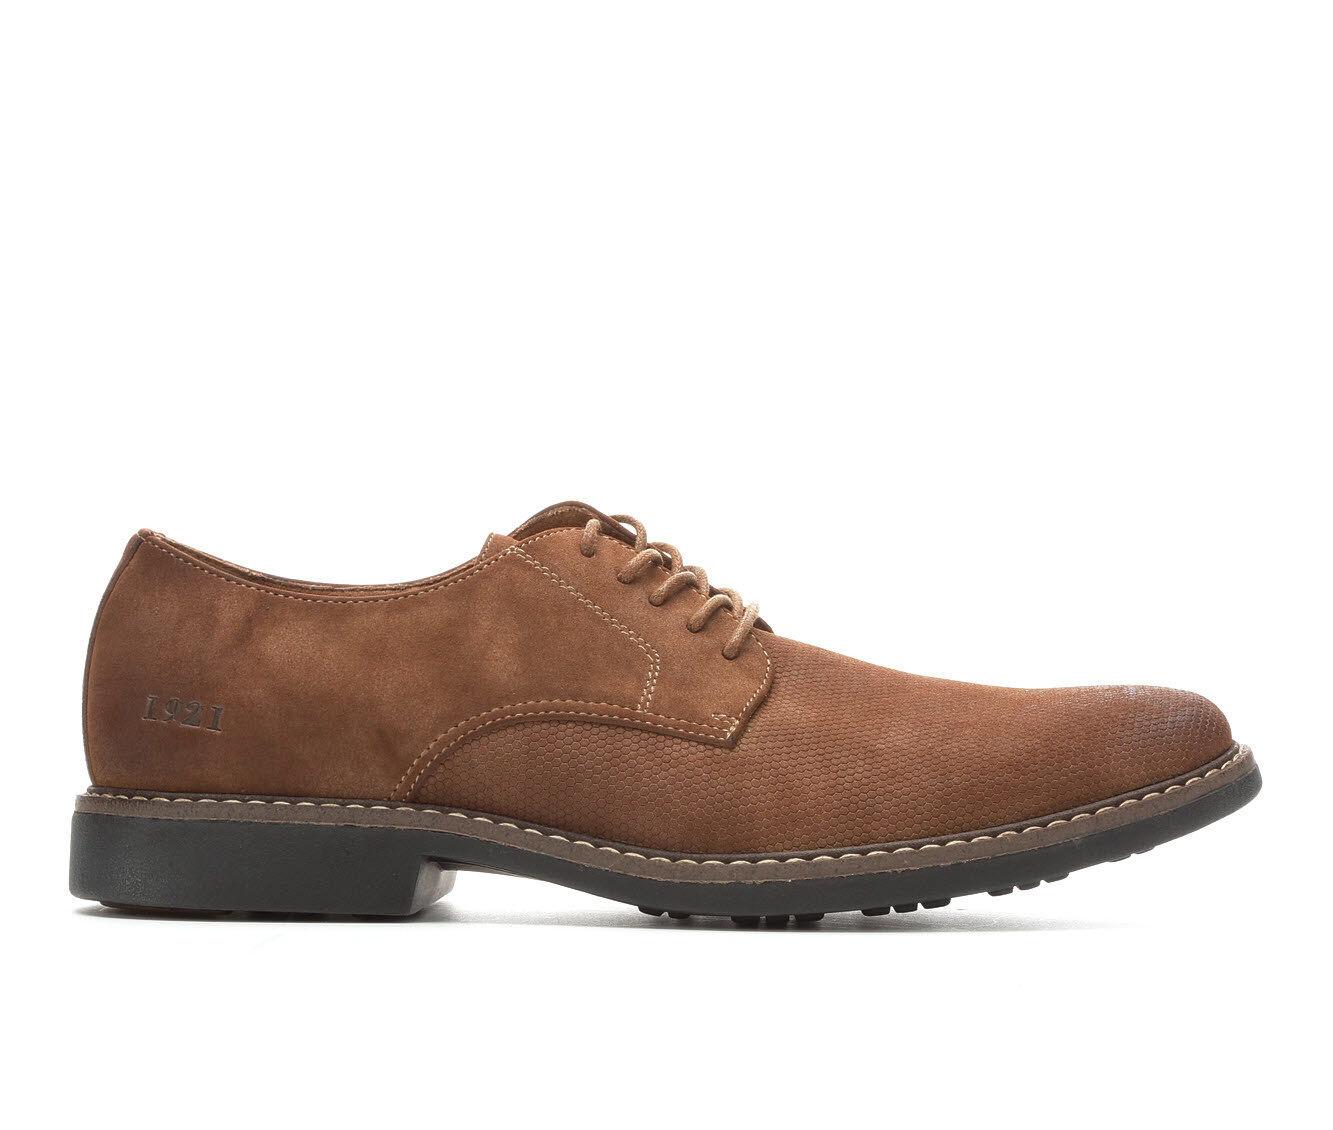 9713aef89bd Mens freeman milton dress shoes shoe carnival jpg 1694x1436 Kohls pointed  blqck mens dress loafers